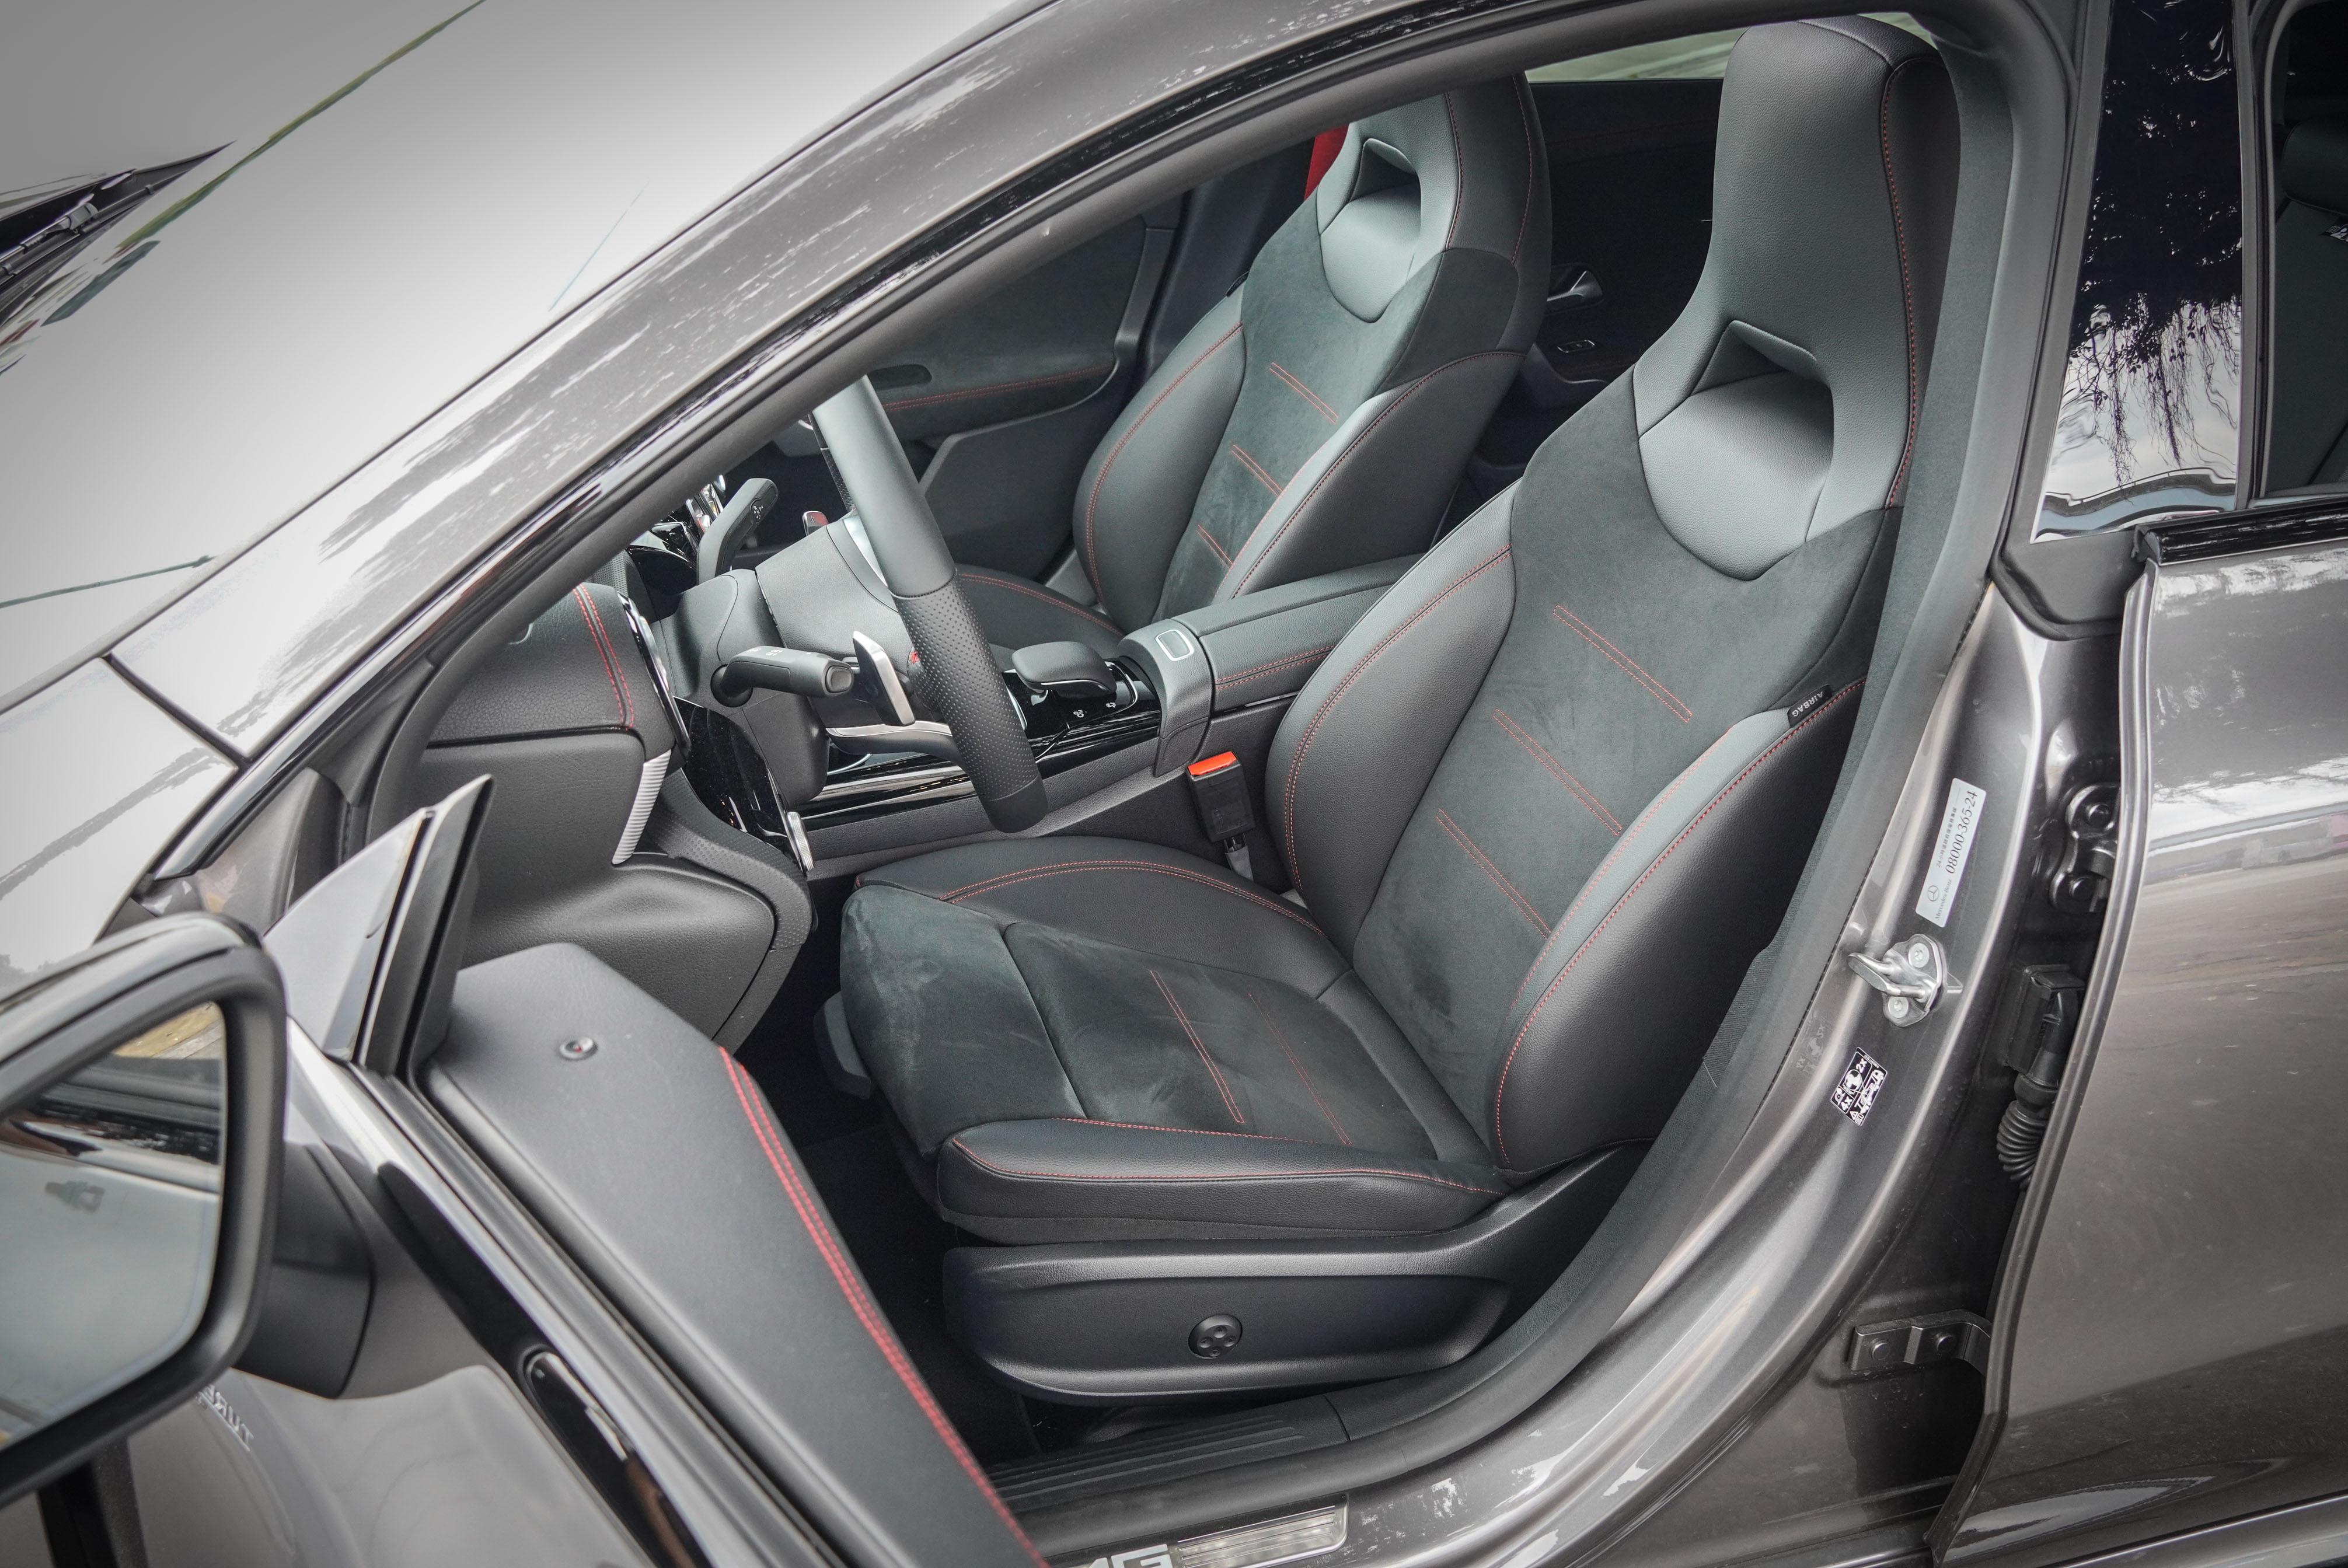 ARTICO / DINAMICA 跑車型座椅側向支撐十足,坐墊也有實用的伸縮膝蓋支撐。